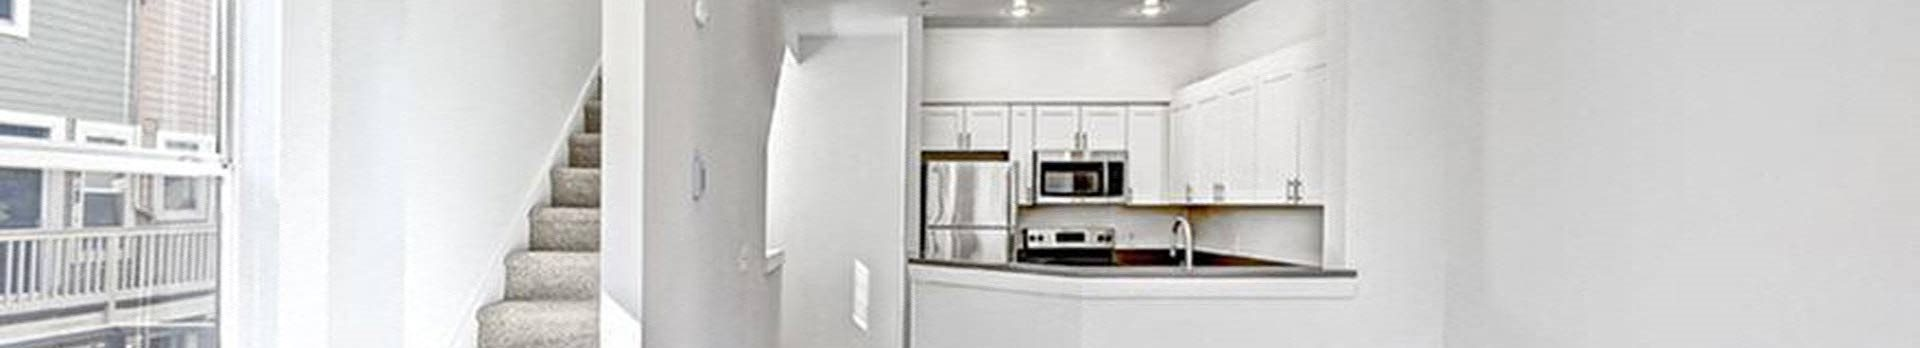 remodeled loft kitchen